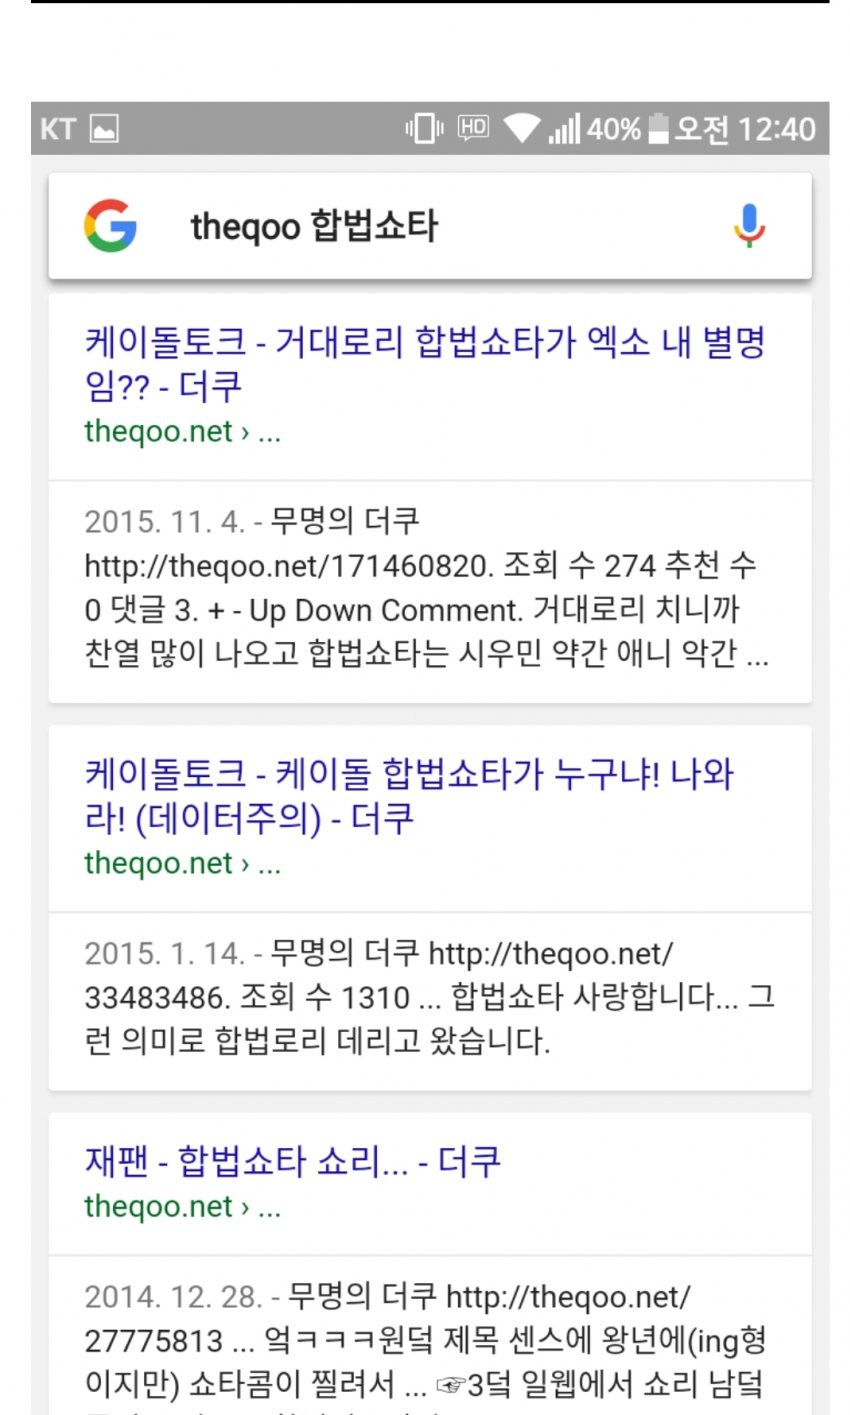 viewimage.php?id=2fbcc323e7d334aa51b1d3a24f&no=24b0d769e1d32ca73fec82fa11d028313f7ca0229f7ff0a914a04ad5fd5f9e1ced337d7e300a1e92117335f9bd48b4f271a7659a9454df2c07e6350844d80c9728490862d1bebd10c5b6ad81e4b3142f959e52229bd46d296ab0ac53c8f9746e8c5c21c2f6ea31c652fa2579fb082188bda613ba